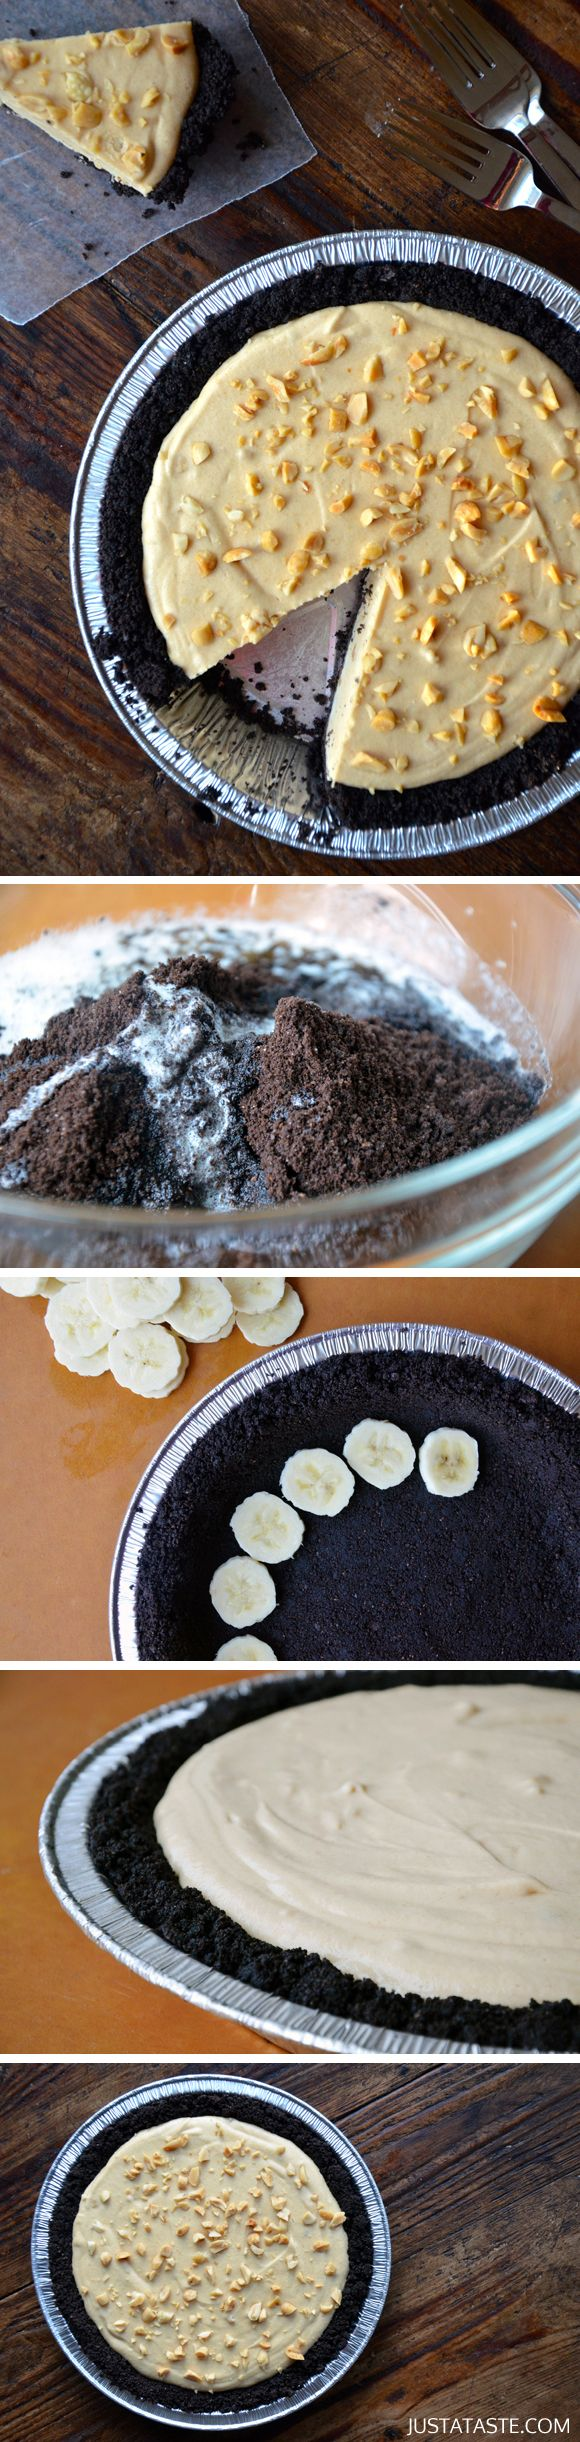 Frozen Peanut Butter Banana Pie #recipe #bananapie